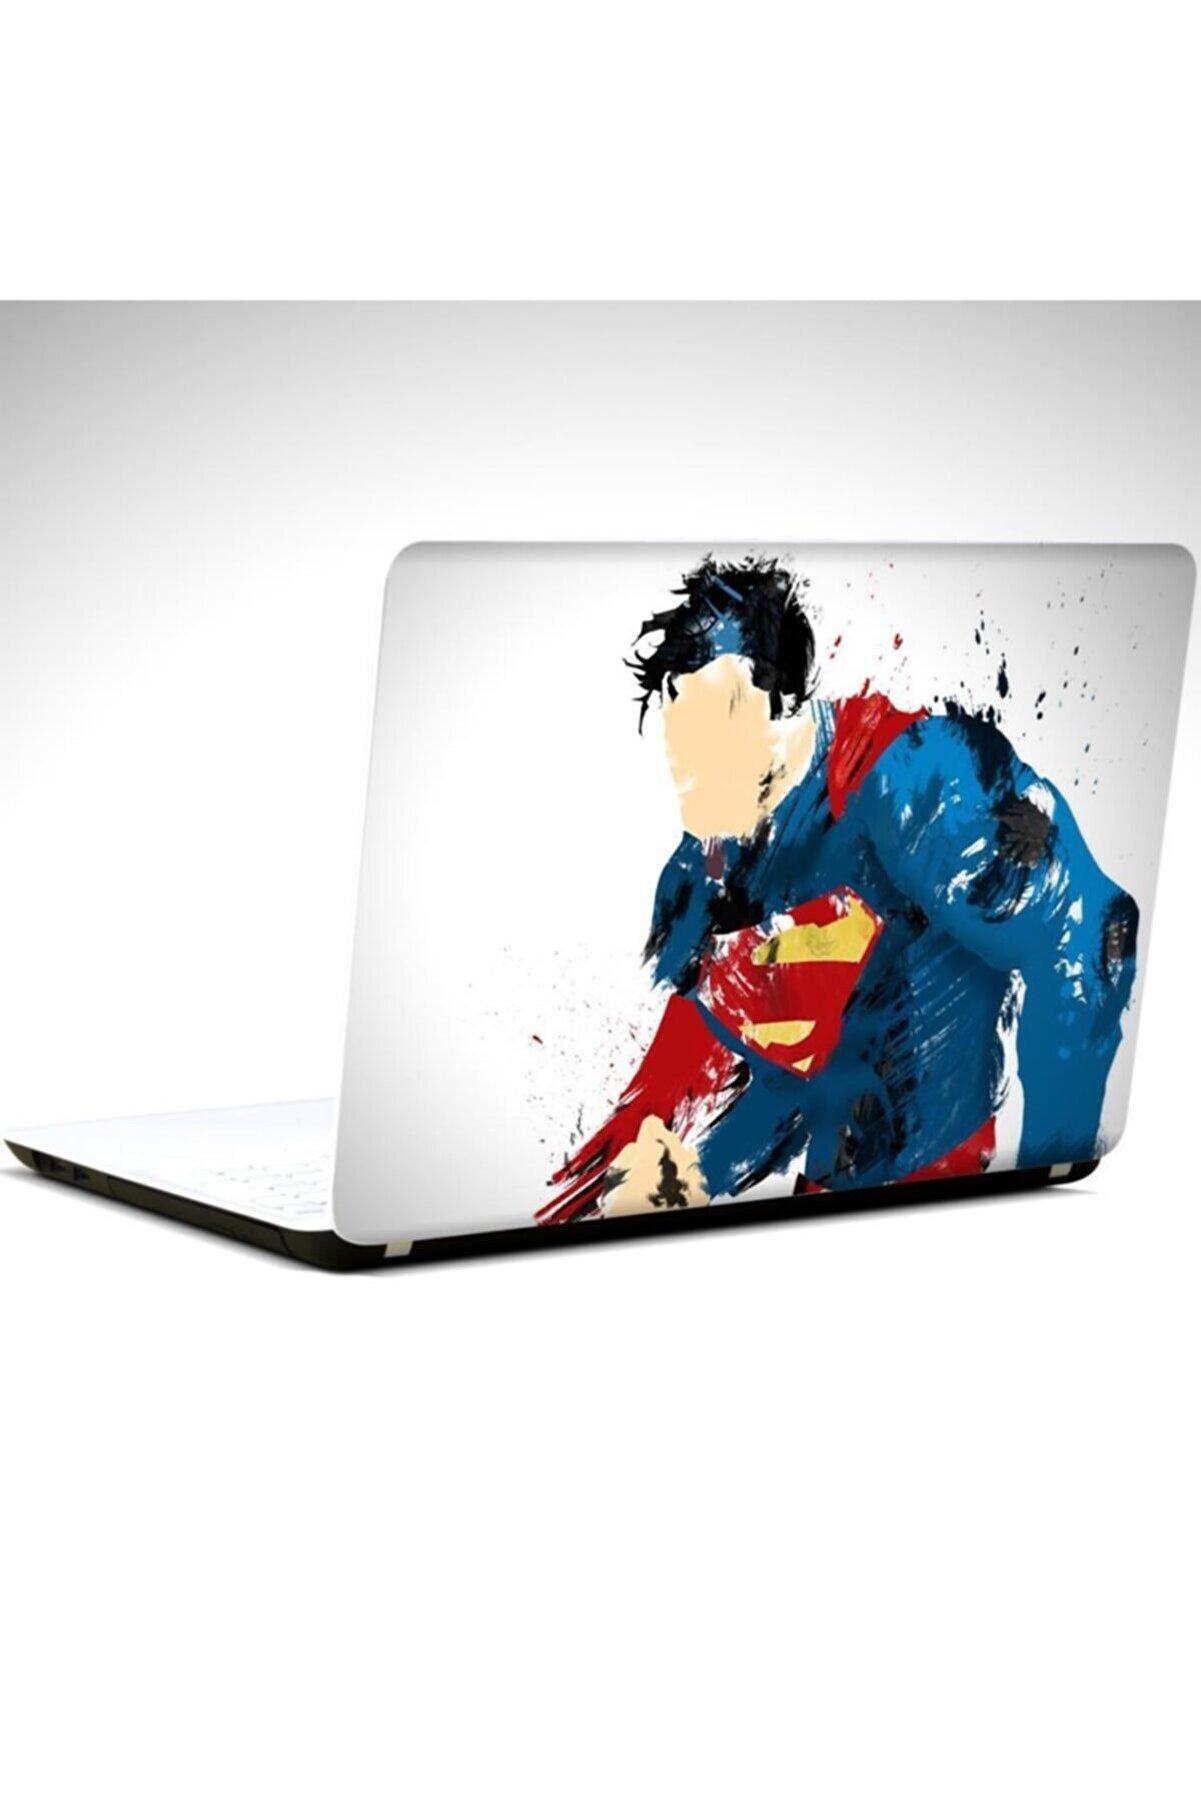 Dekolata Süperman 2 Laptop Sticker 19 Inch (40,5x27 cm)